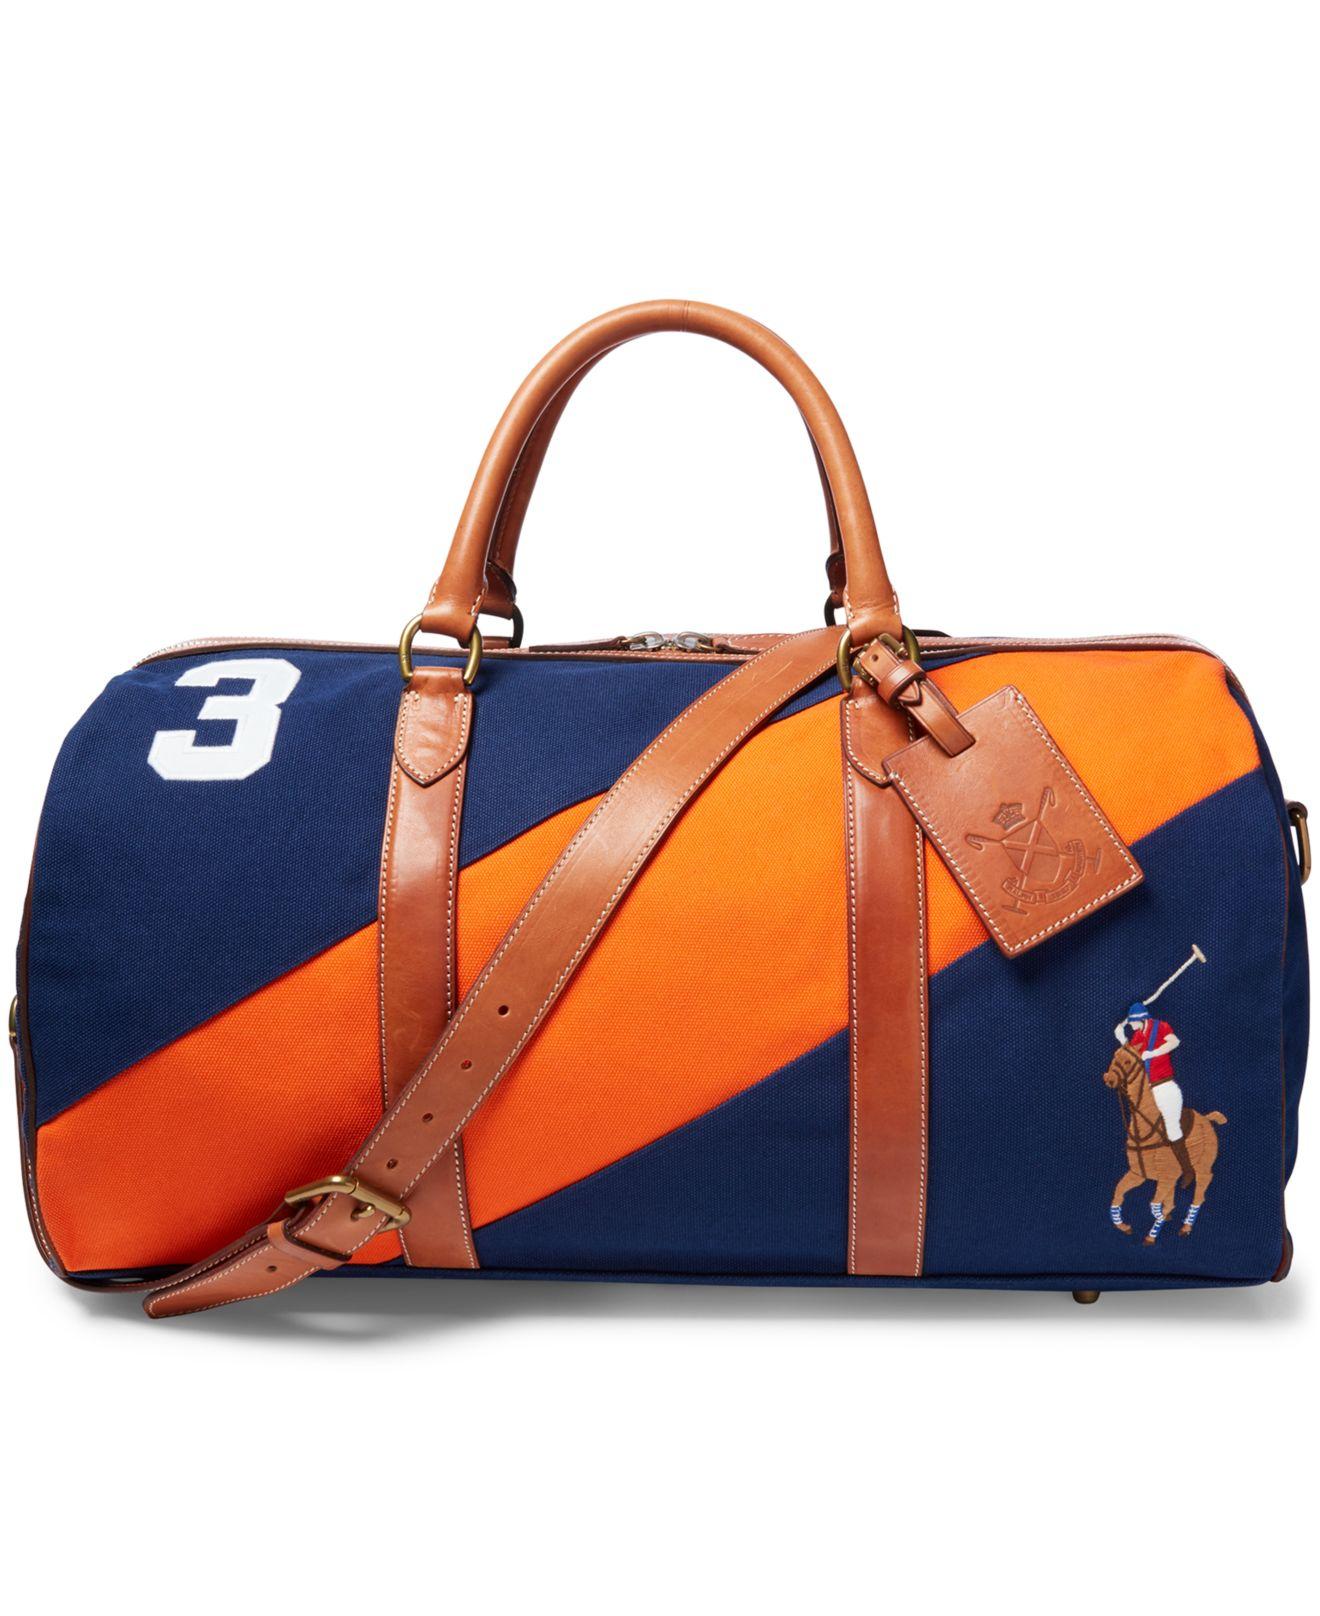 37039339f1b5 Polo ralph lauren navy orange canvas black watch leather detail duffel bag  blue product normal jpg